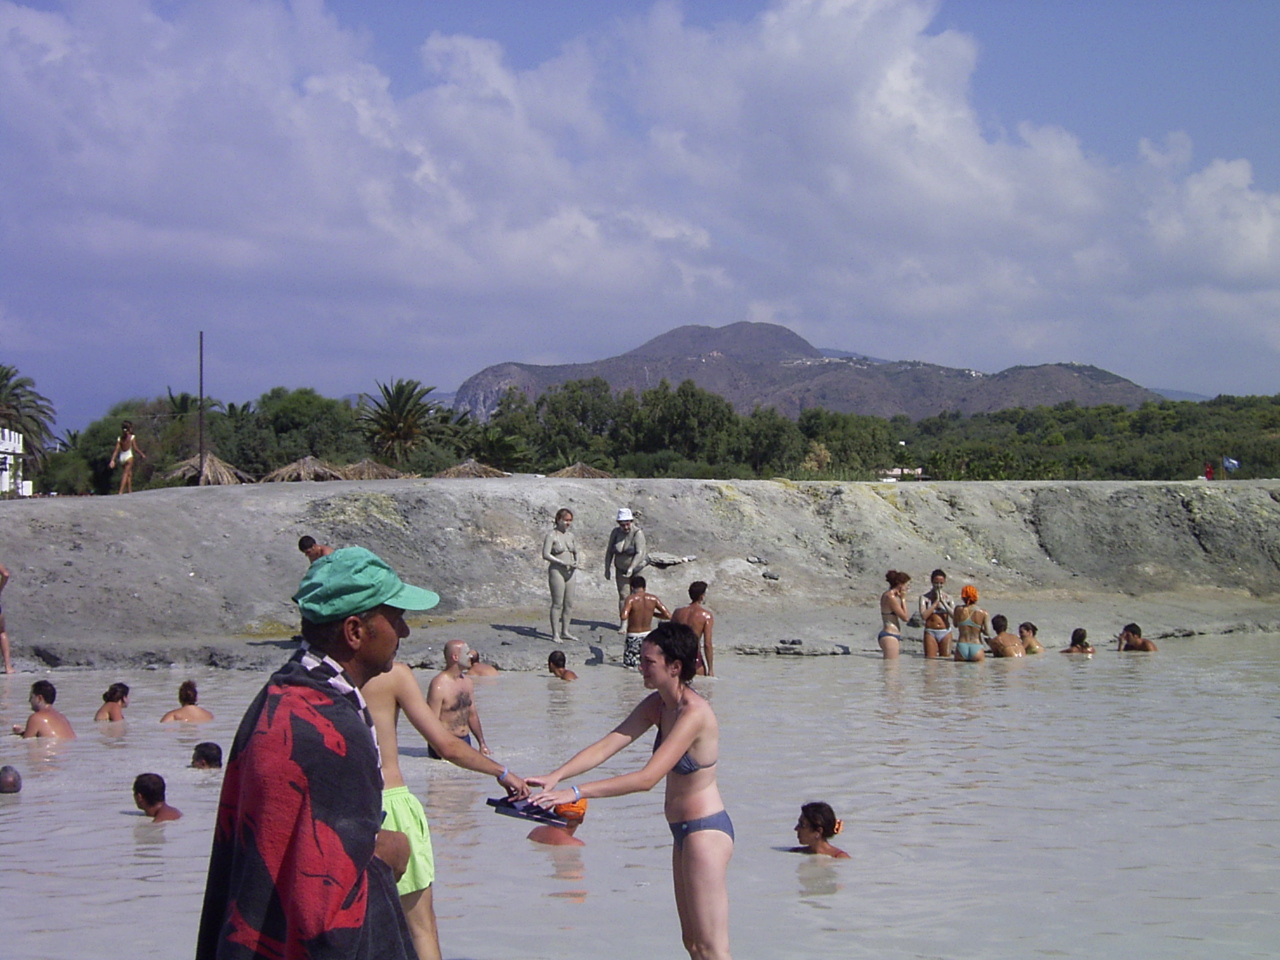 Panorama sull'isola